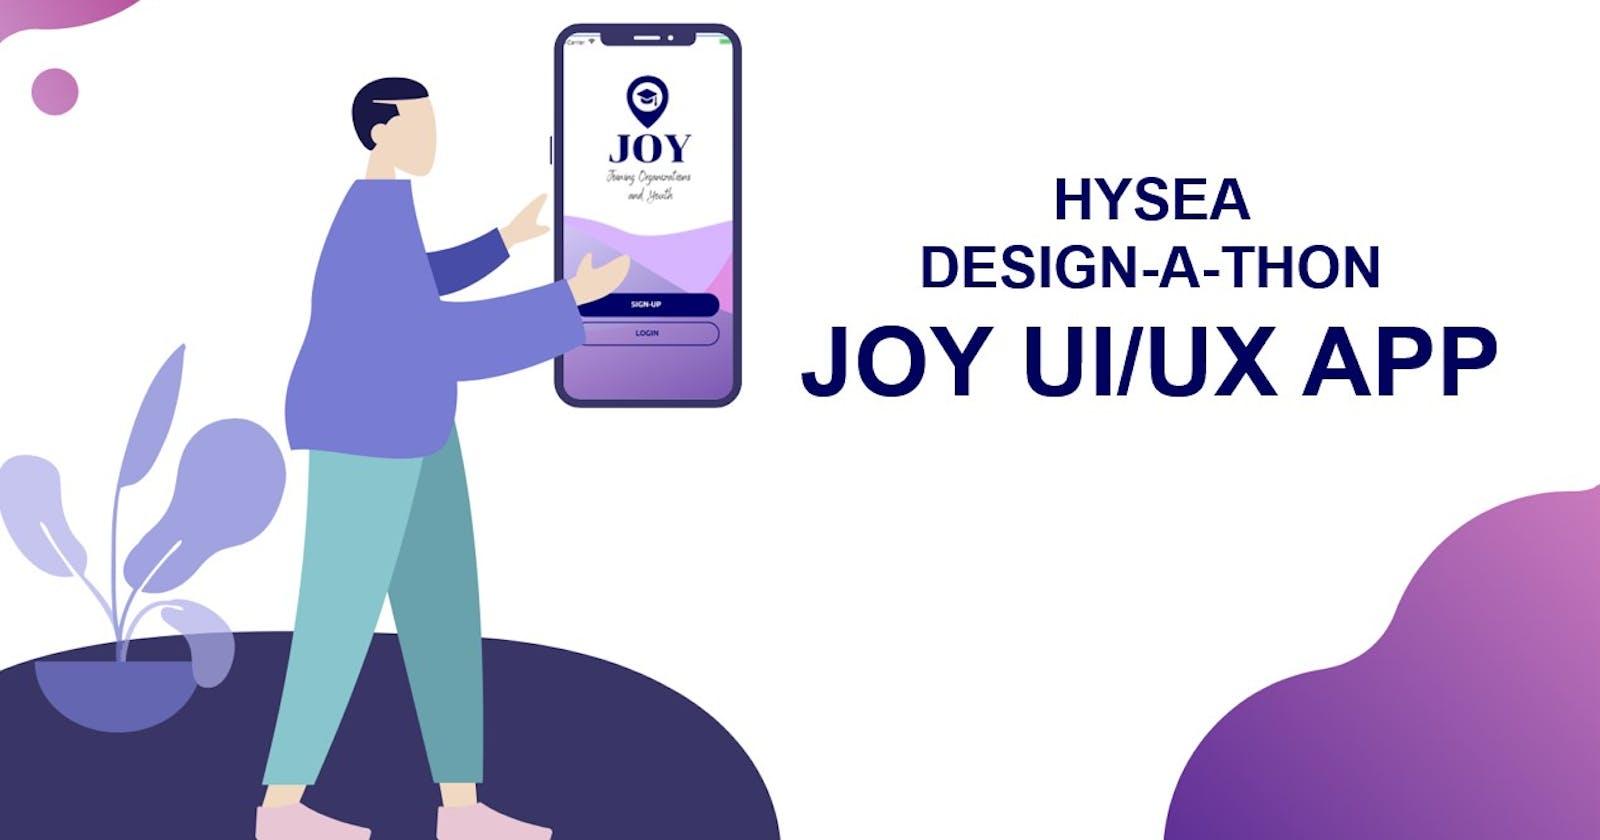 Joy UI/UX DESIGN